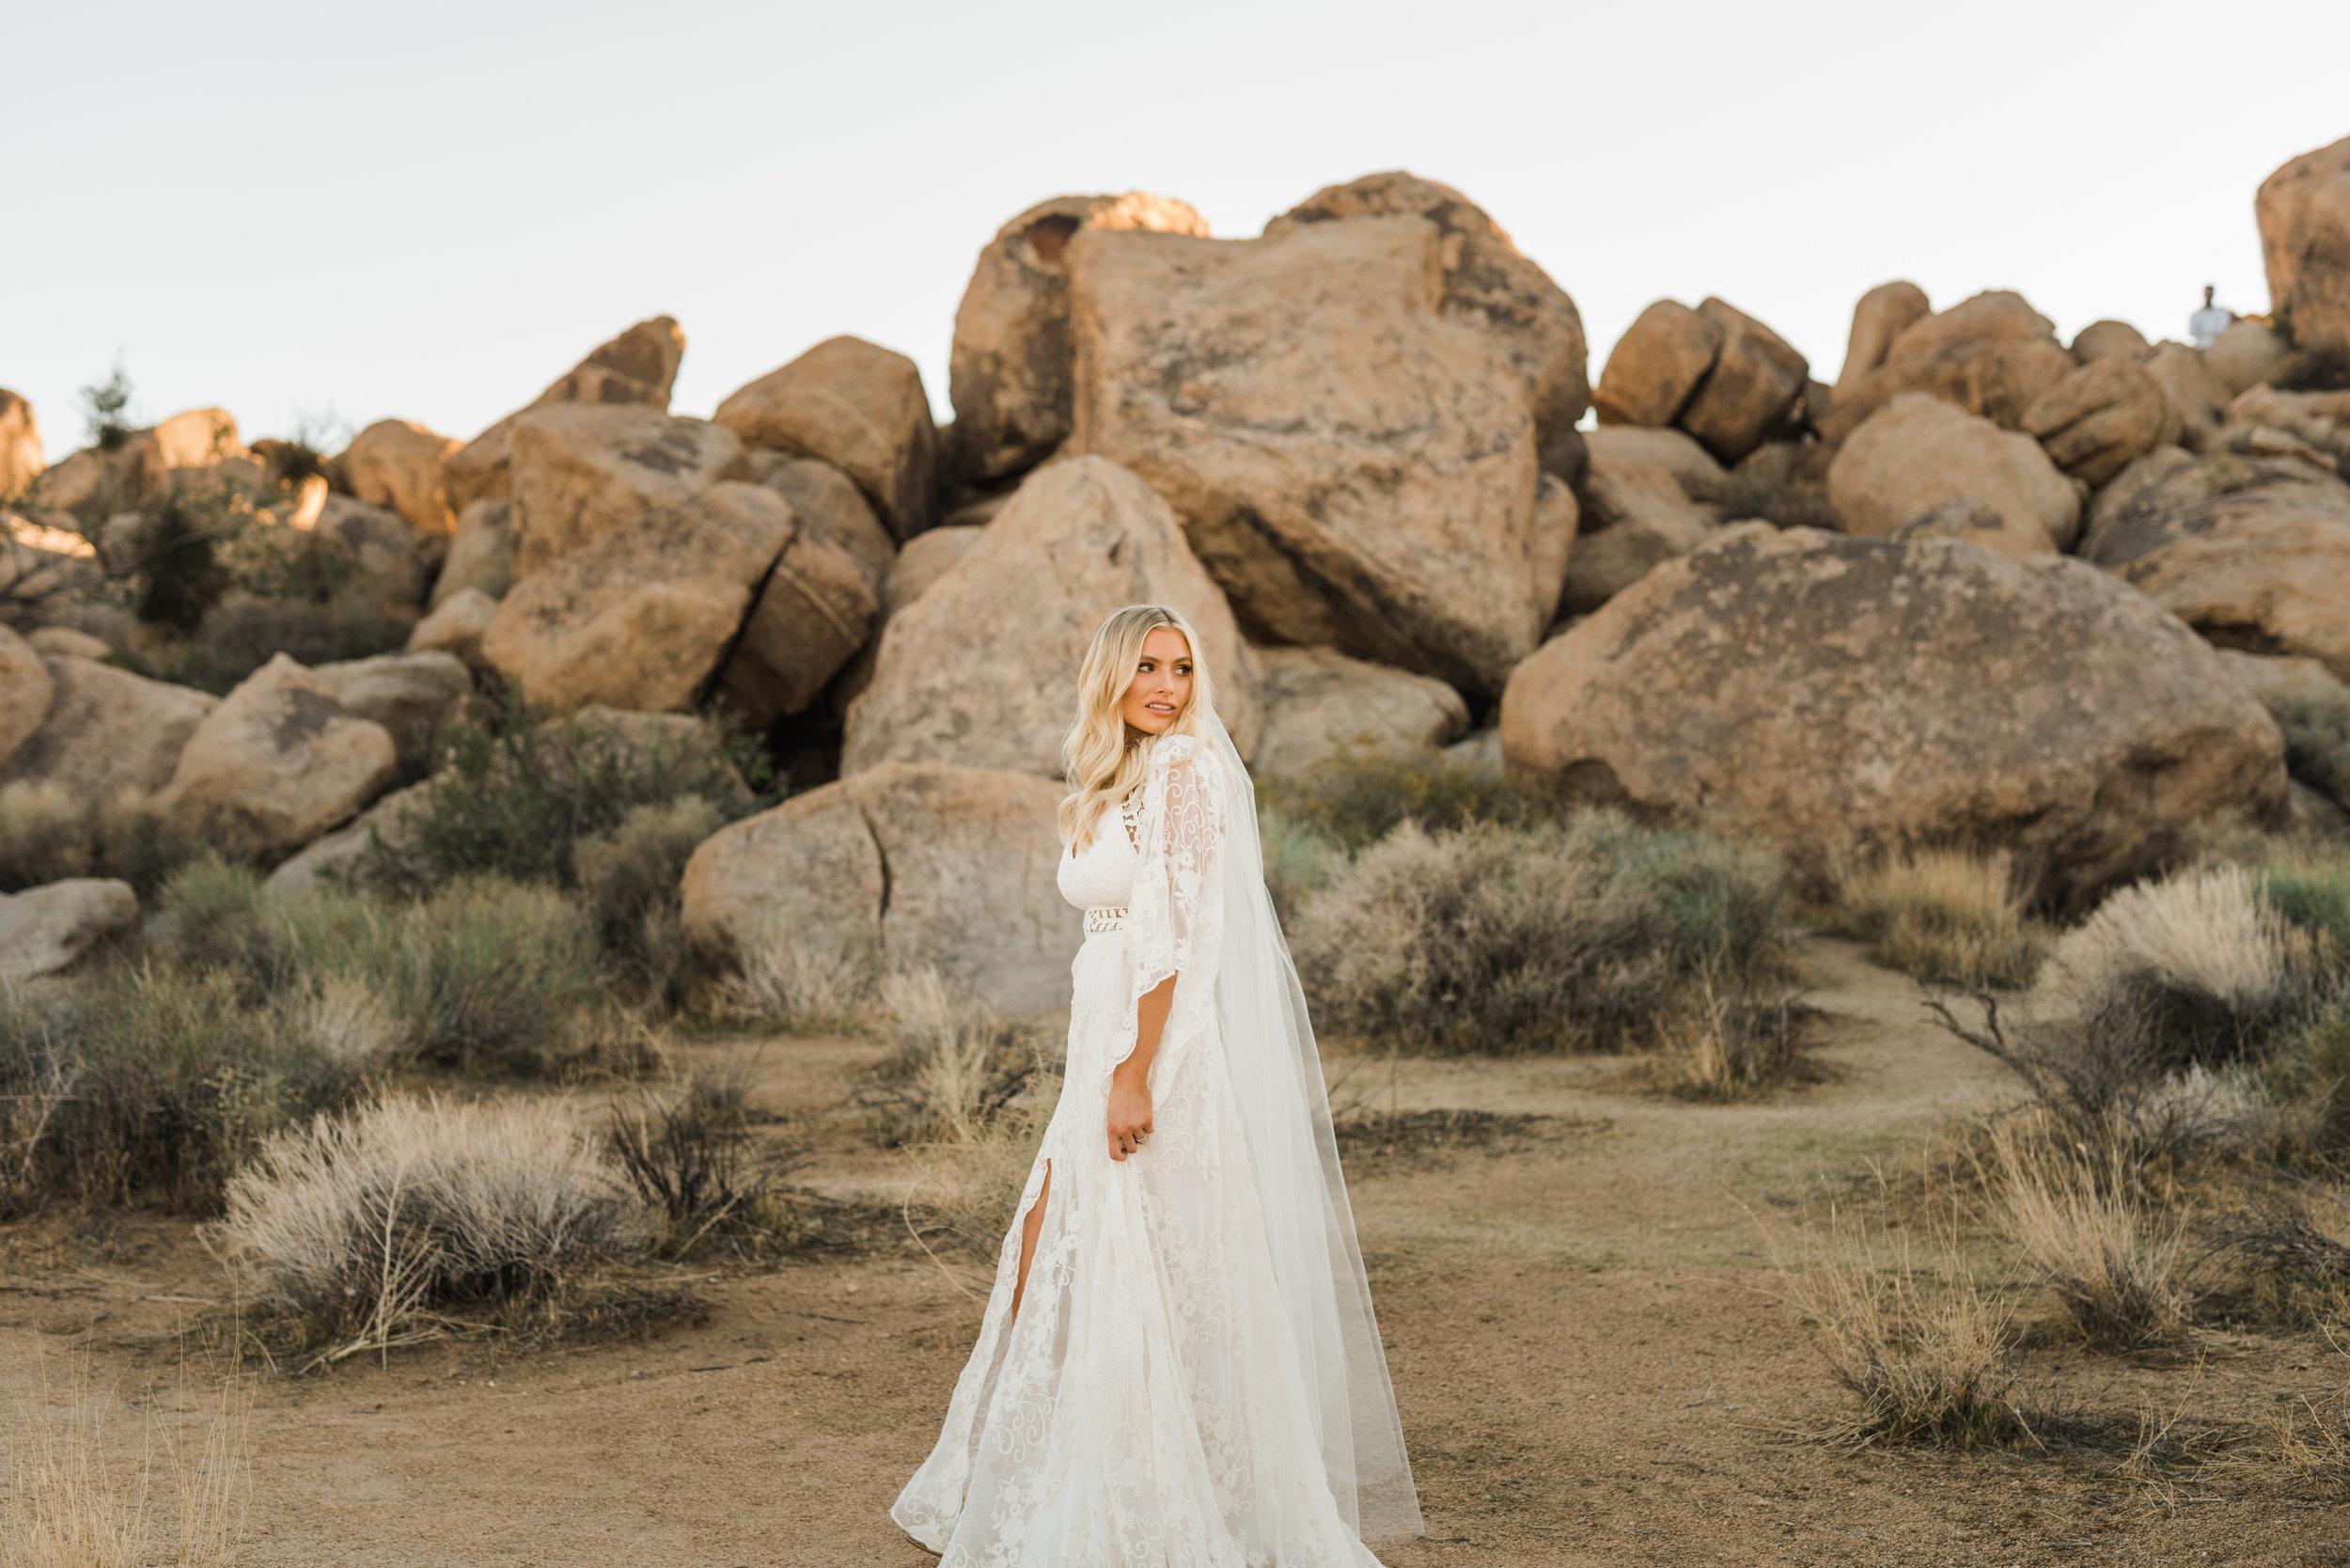 Elopement bride with veil in Rue De Seine dress at Joshua Tree National Park